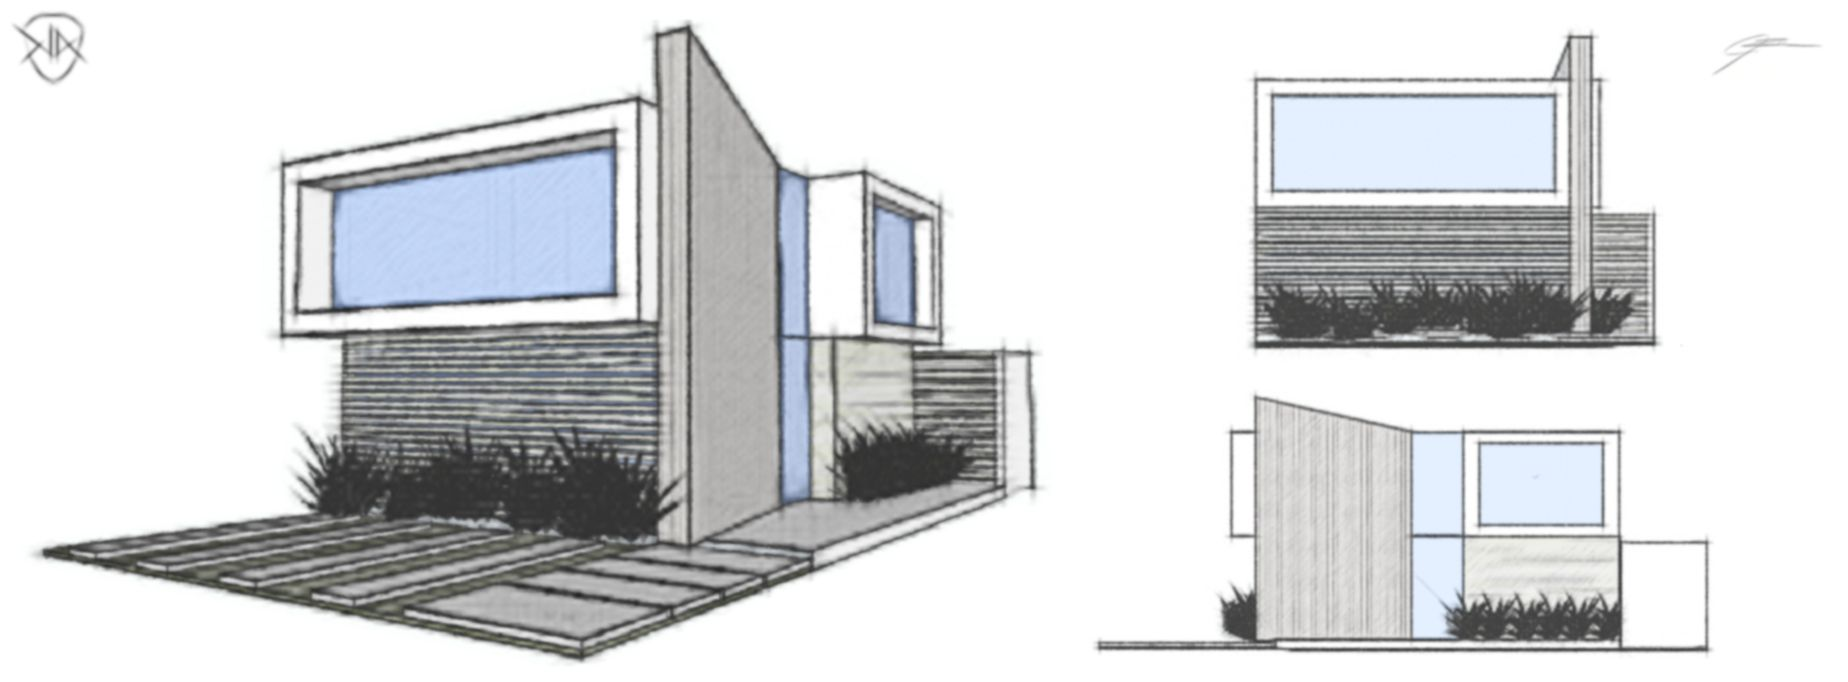 RSI M House Conceptual